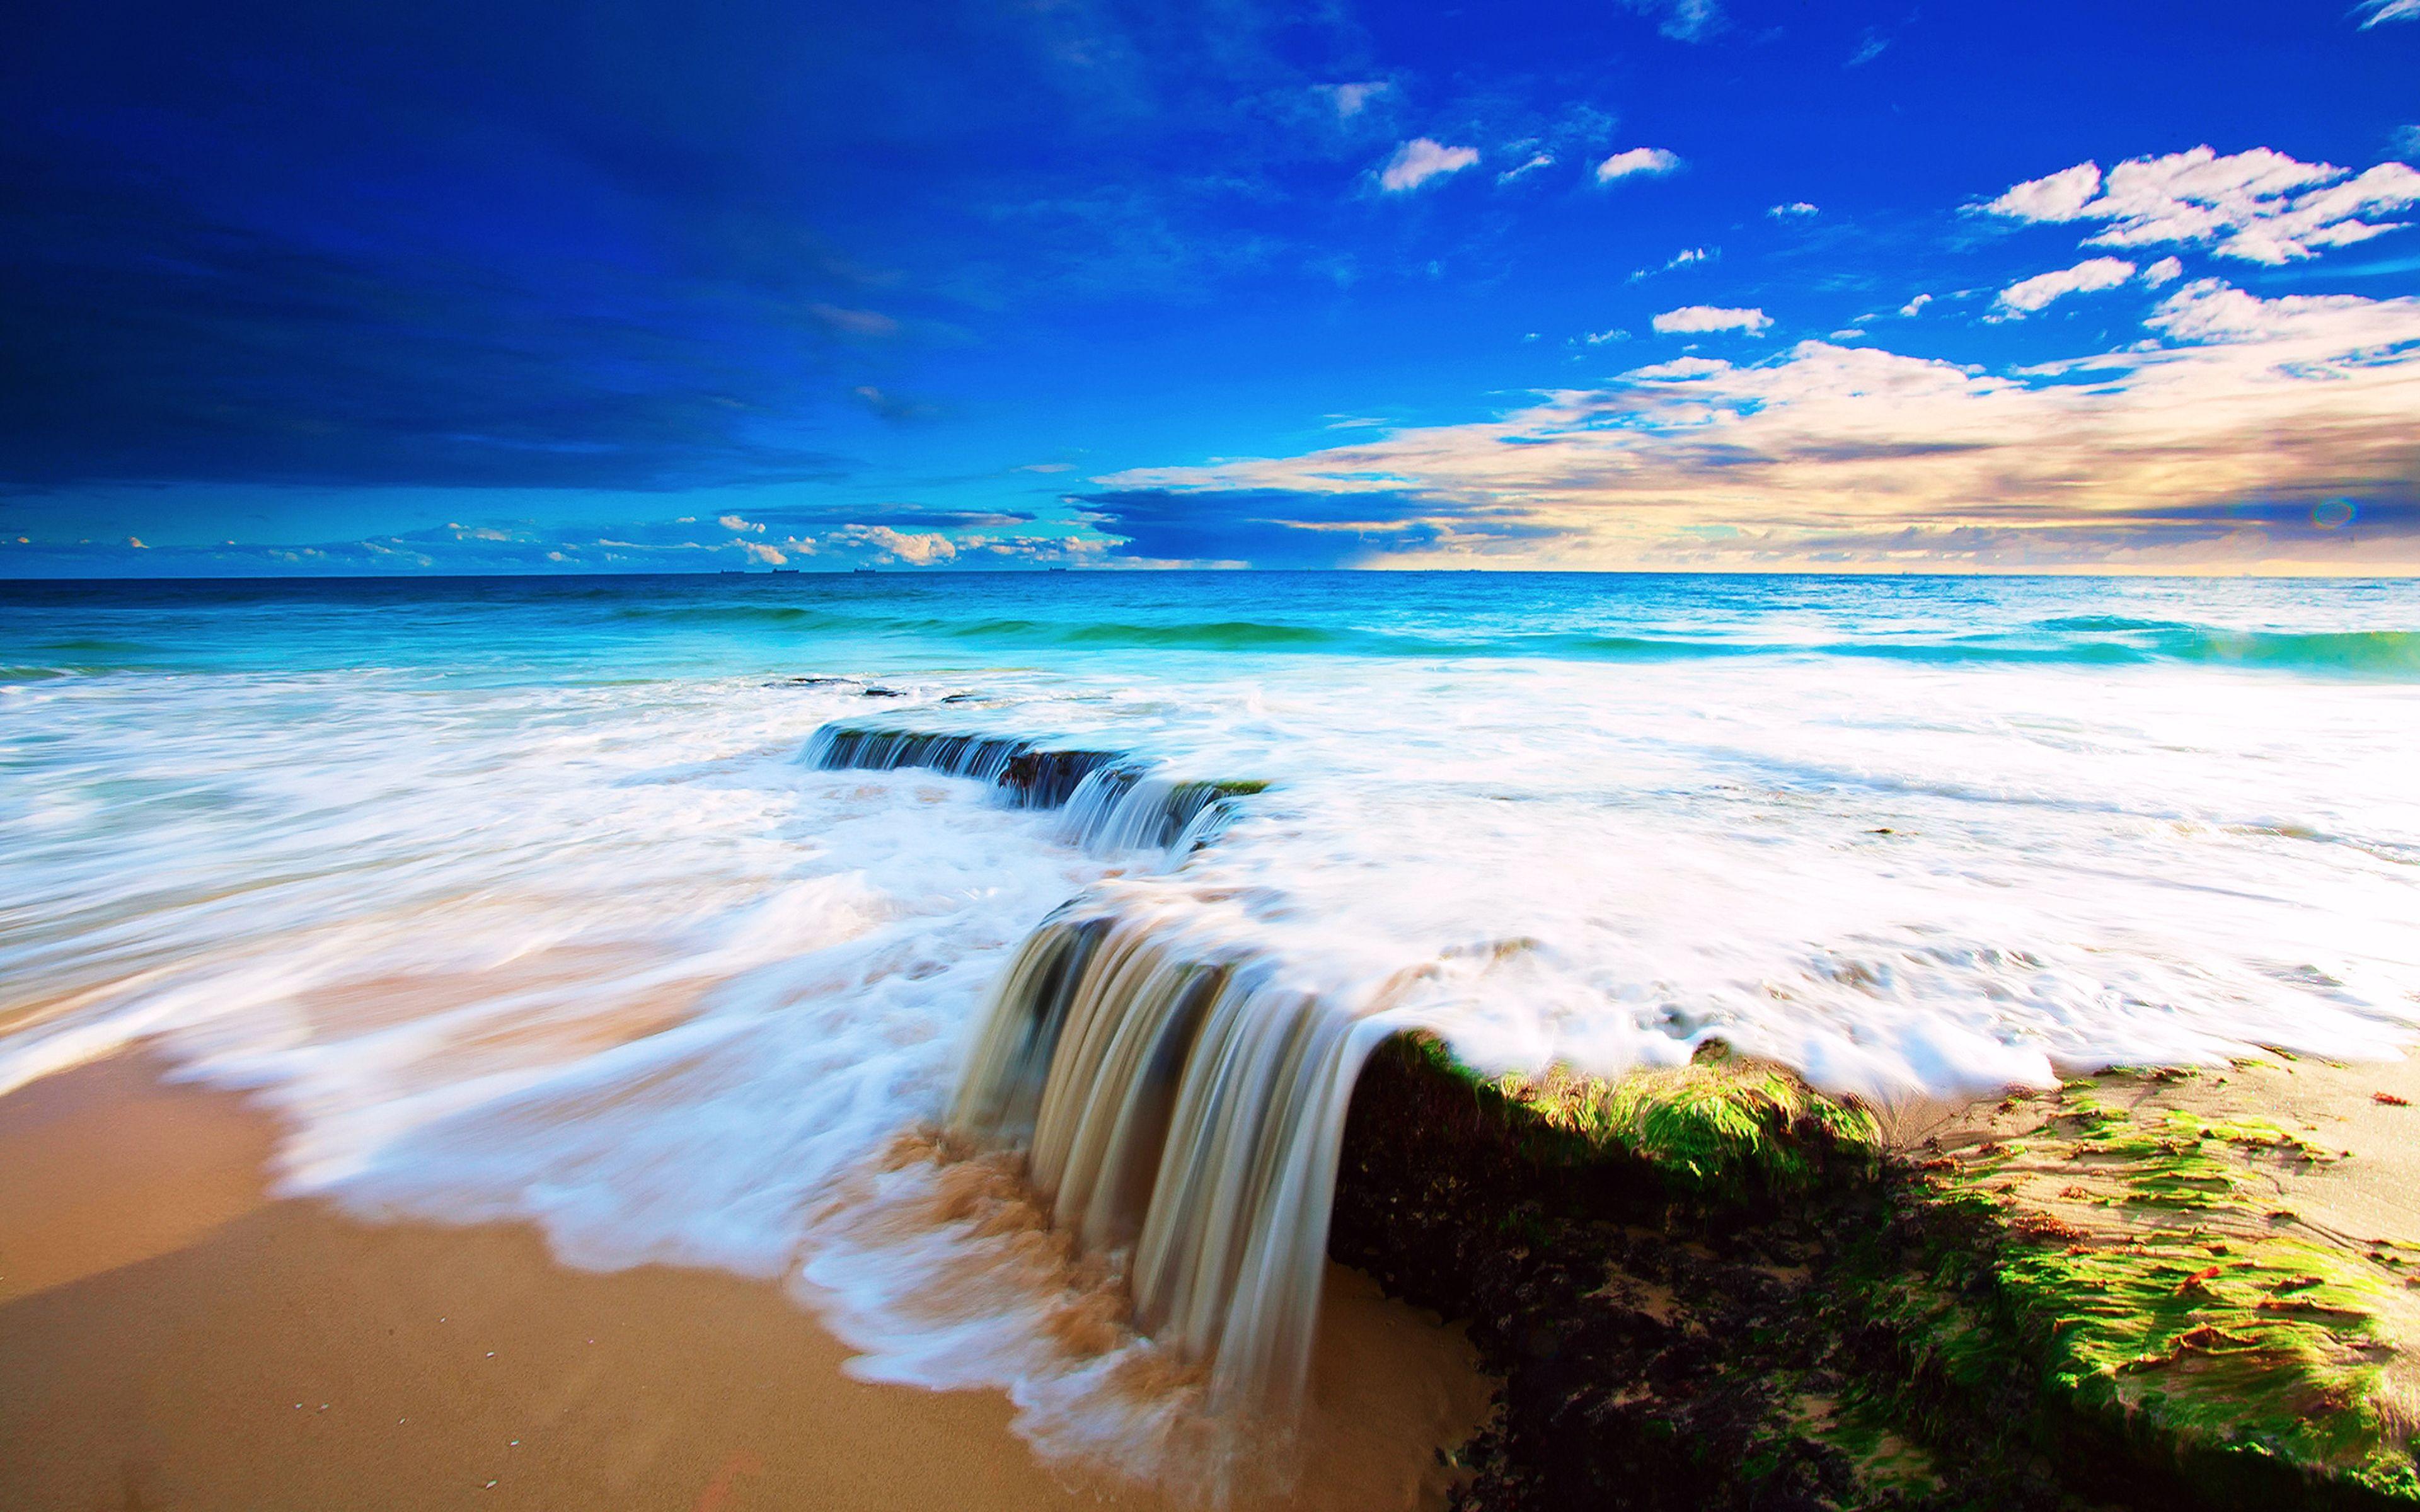 ocean wallpaper desktop background #z4x | earth | pinterest | ocean